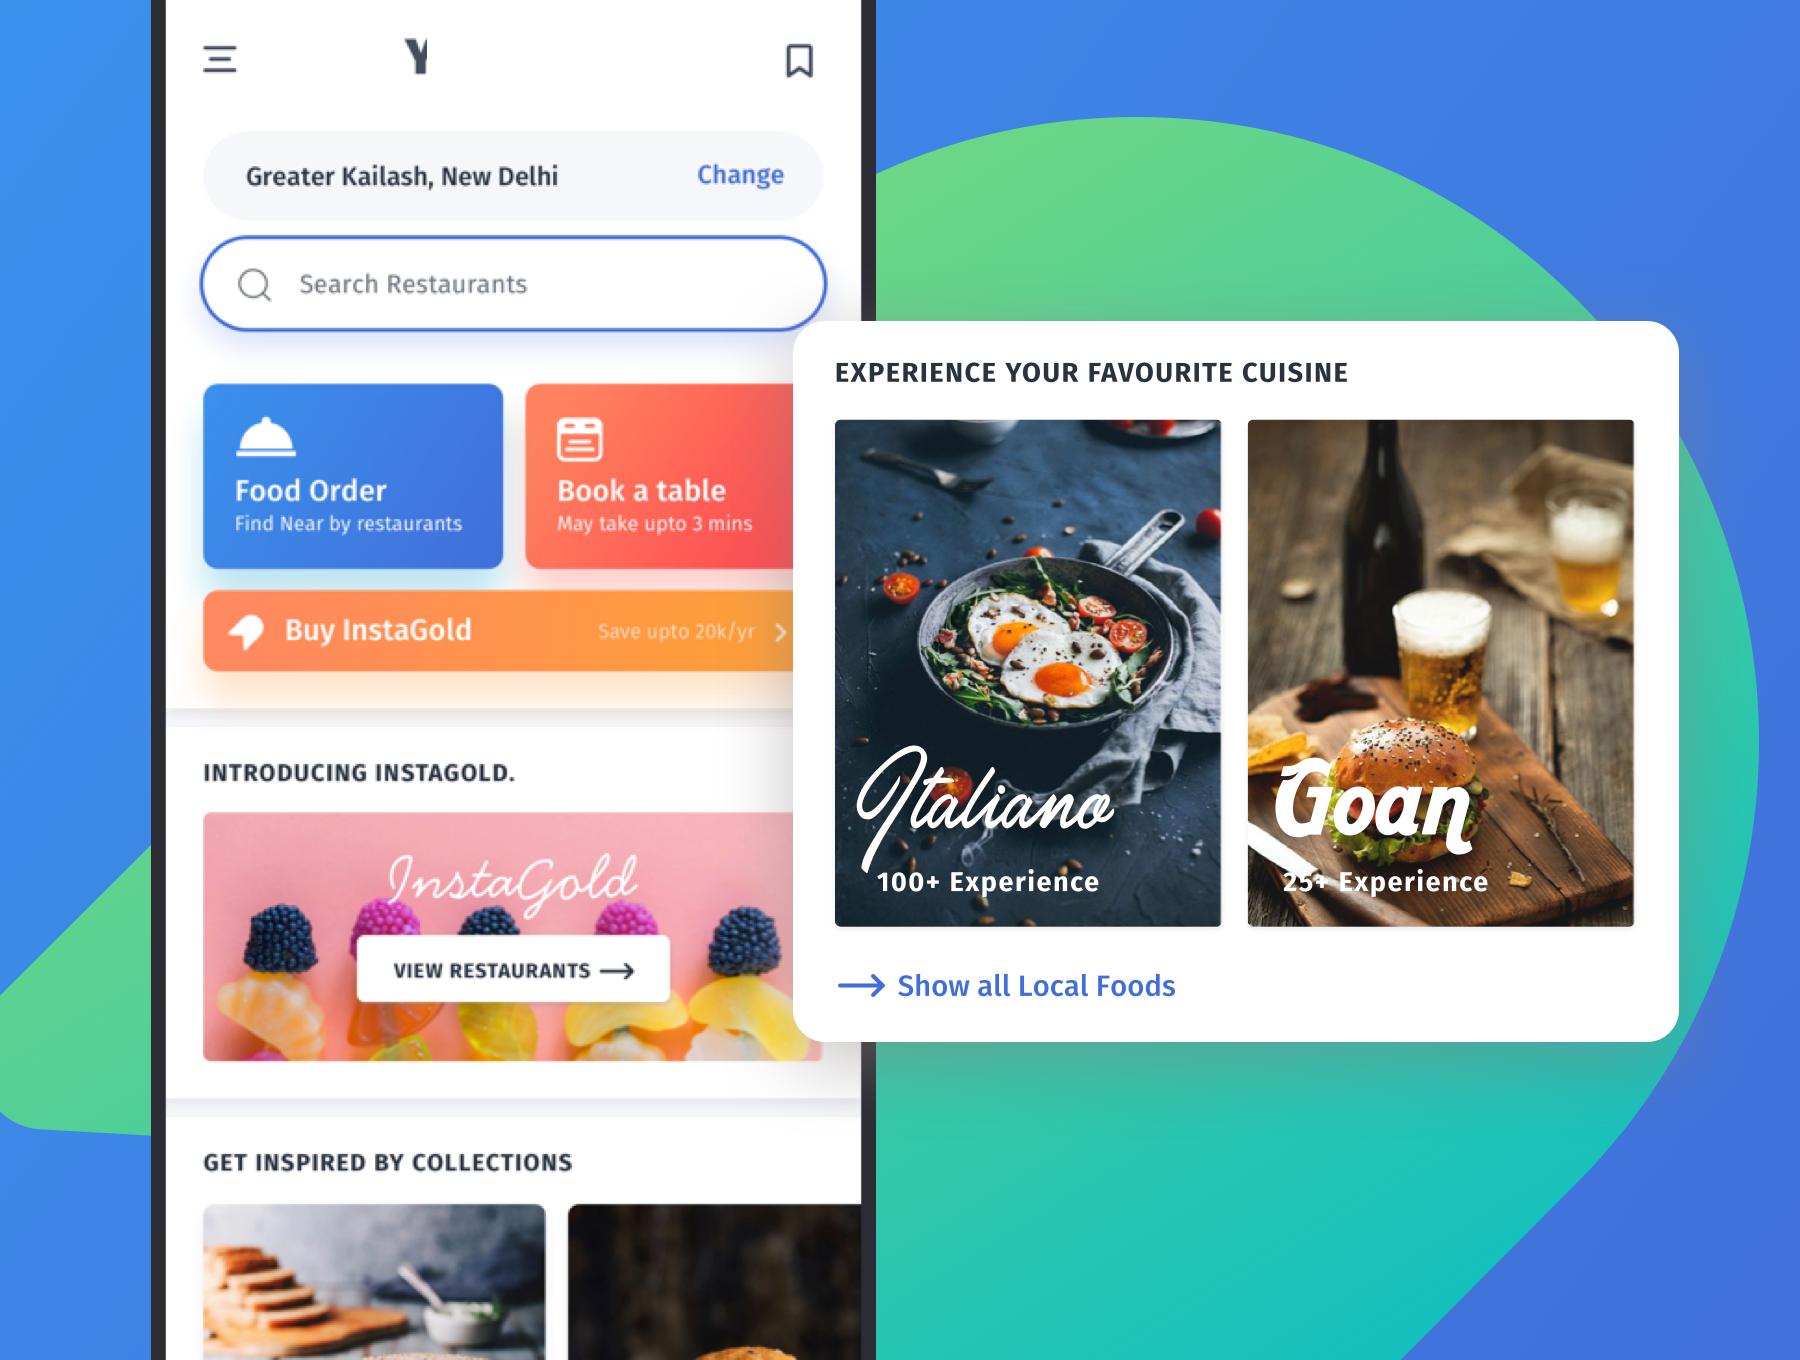 咖啡店酒店餐馆食品外卖APP应用程序UI界面设计套件 YumFood – Mobile App UI kit插图(1)